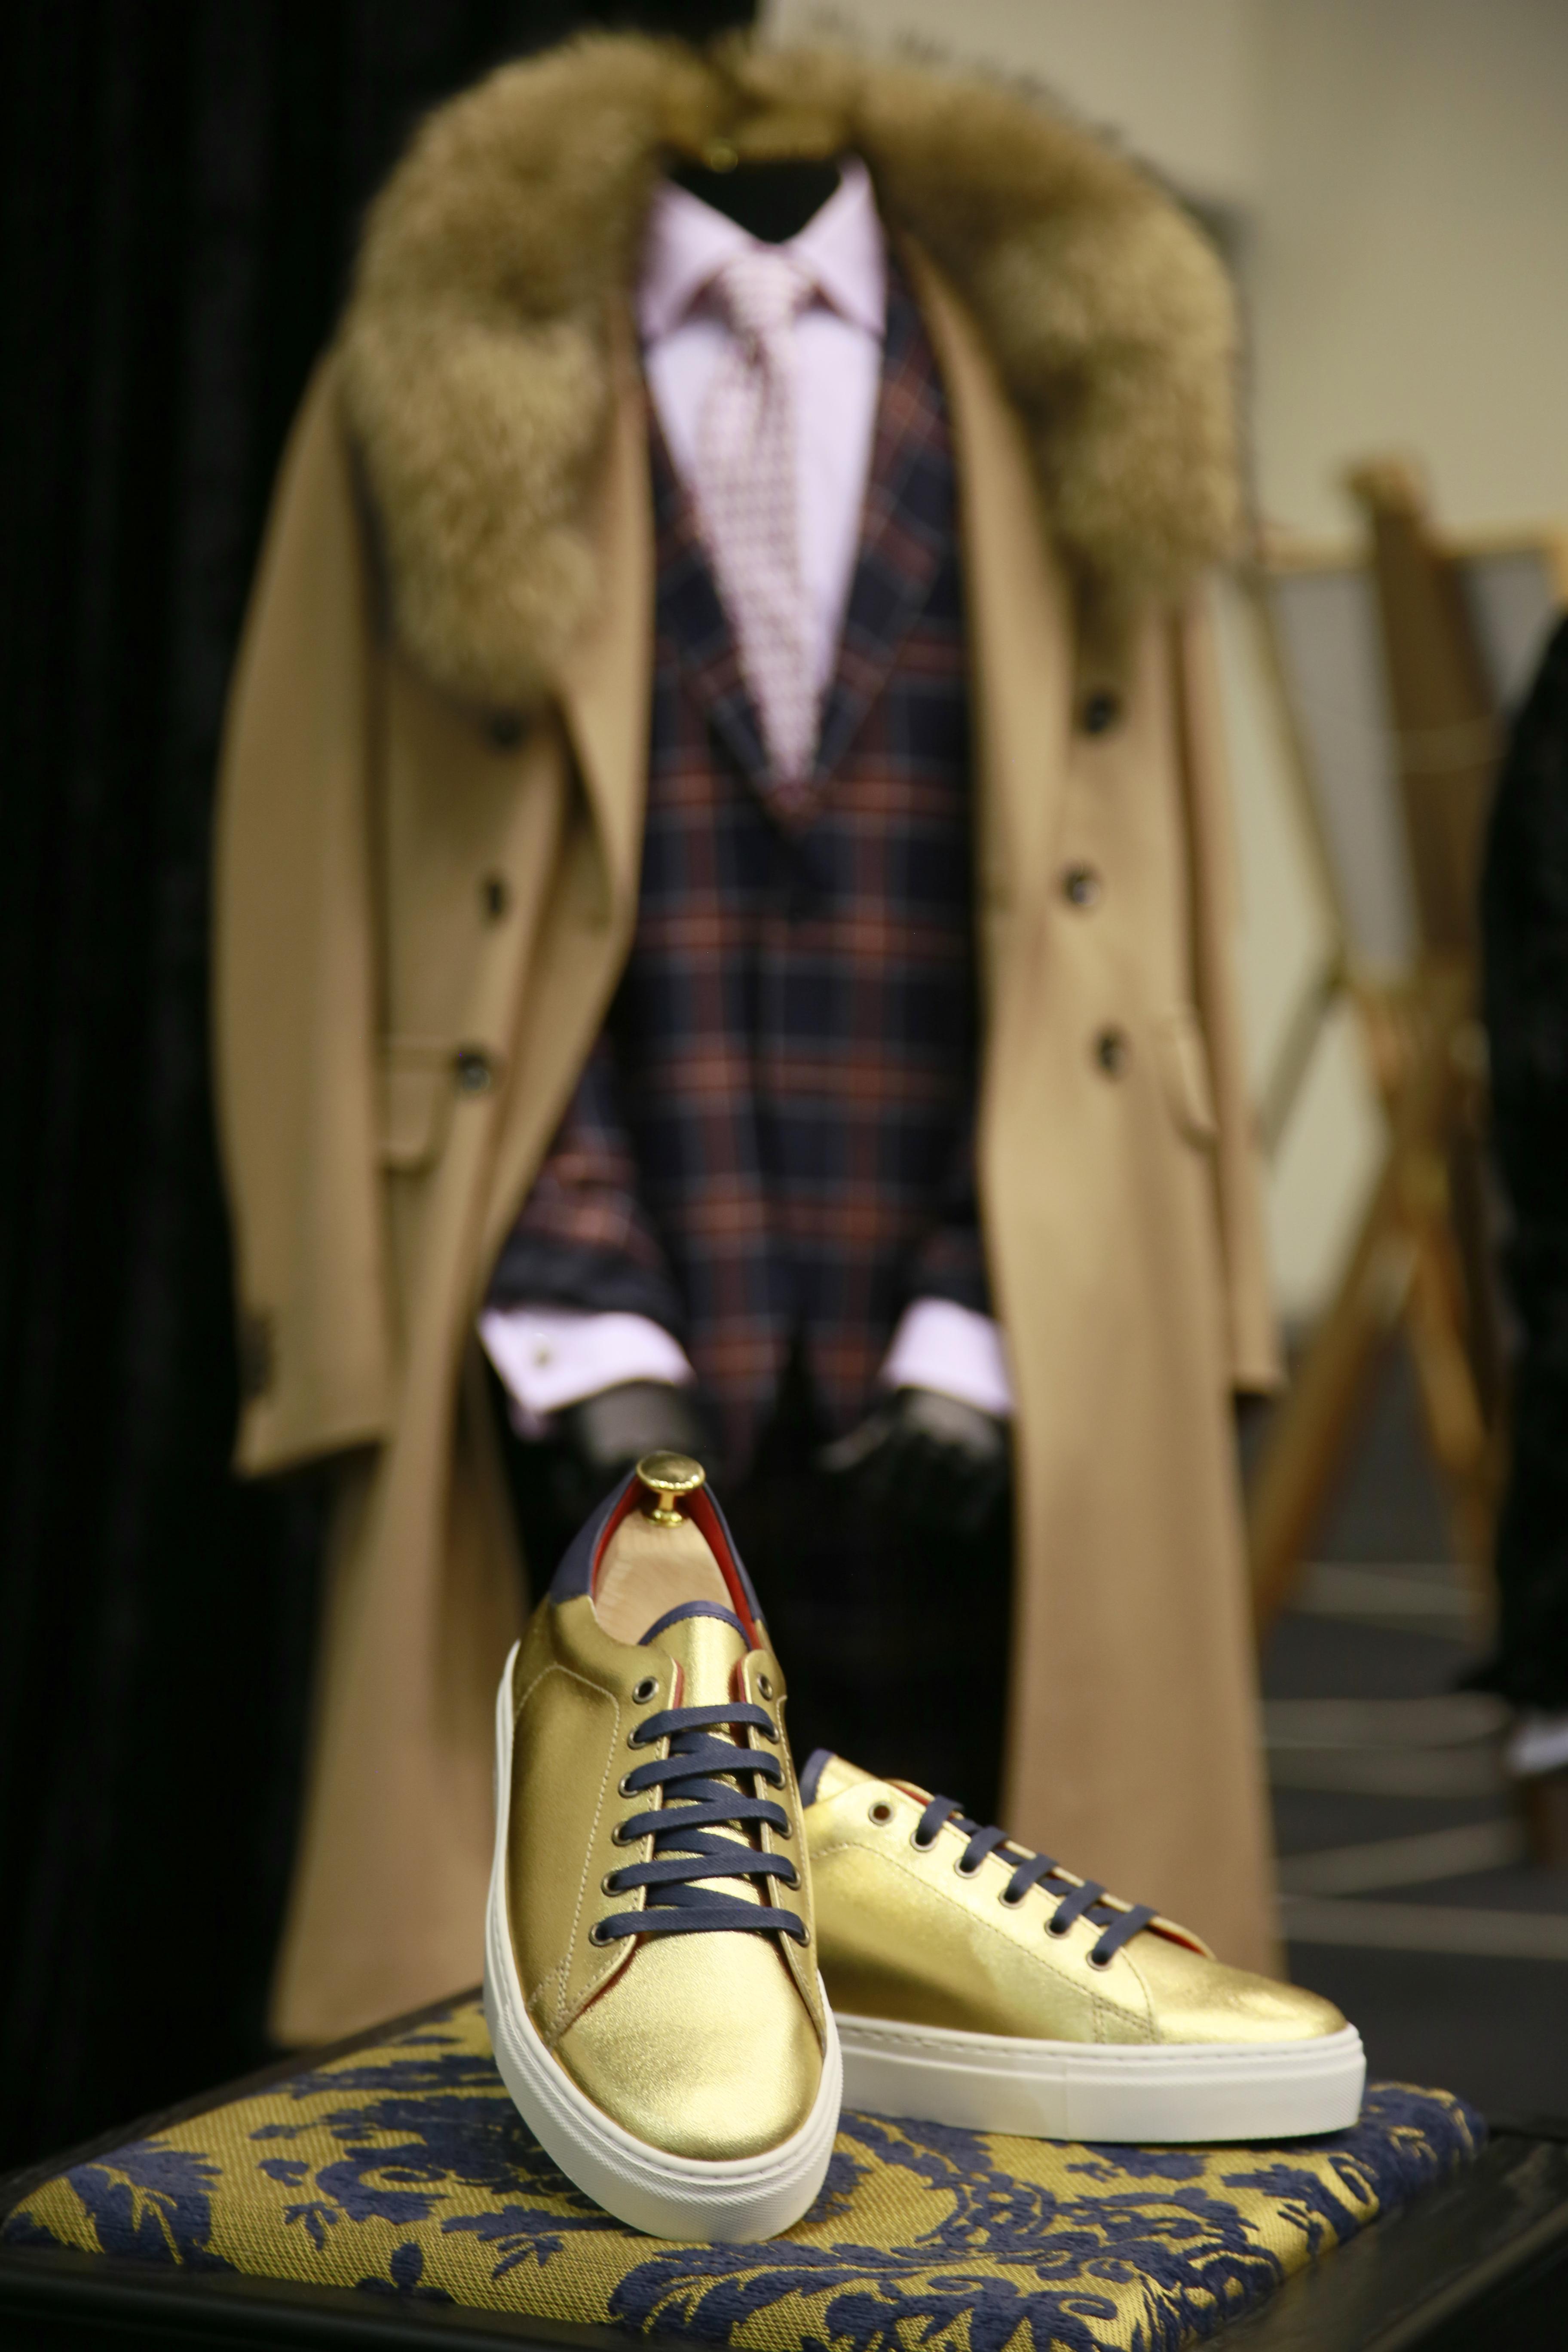 Men's designer clothing